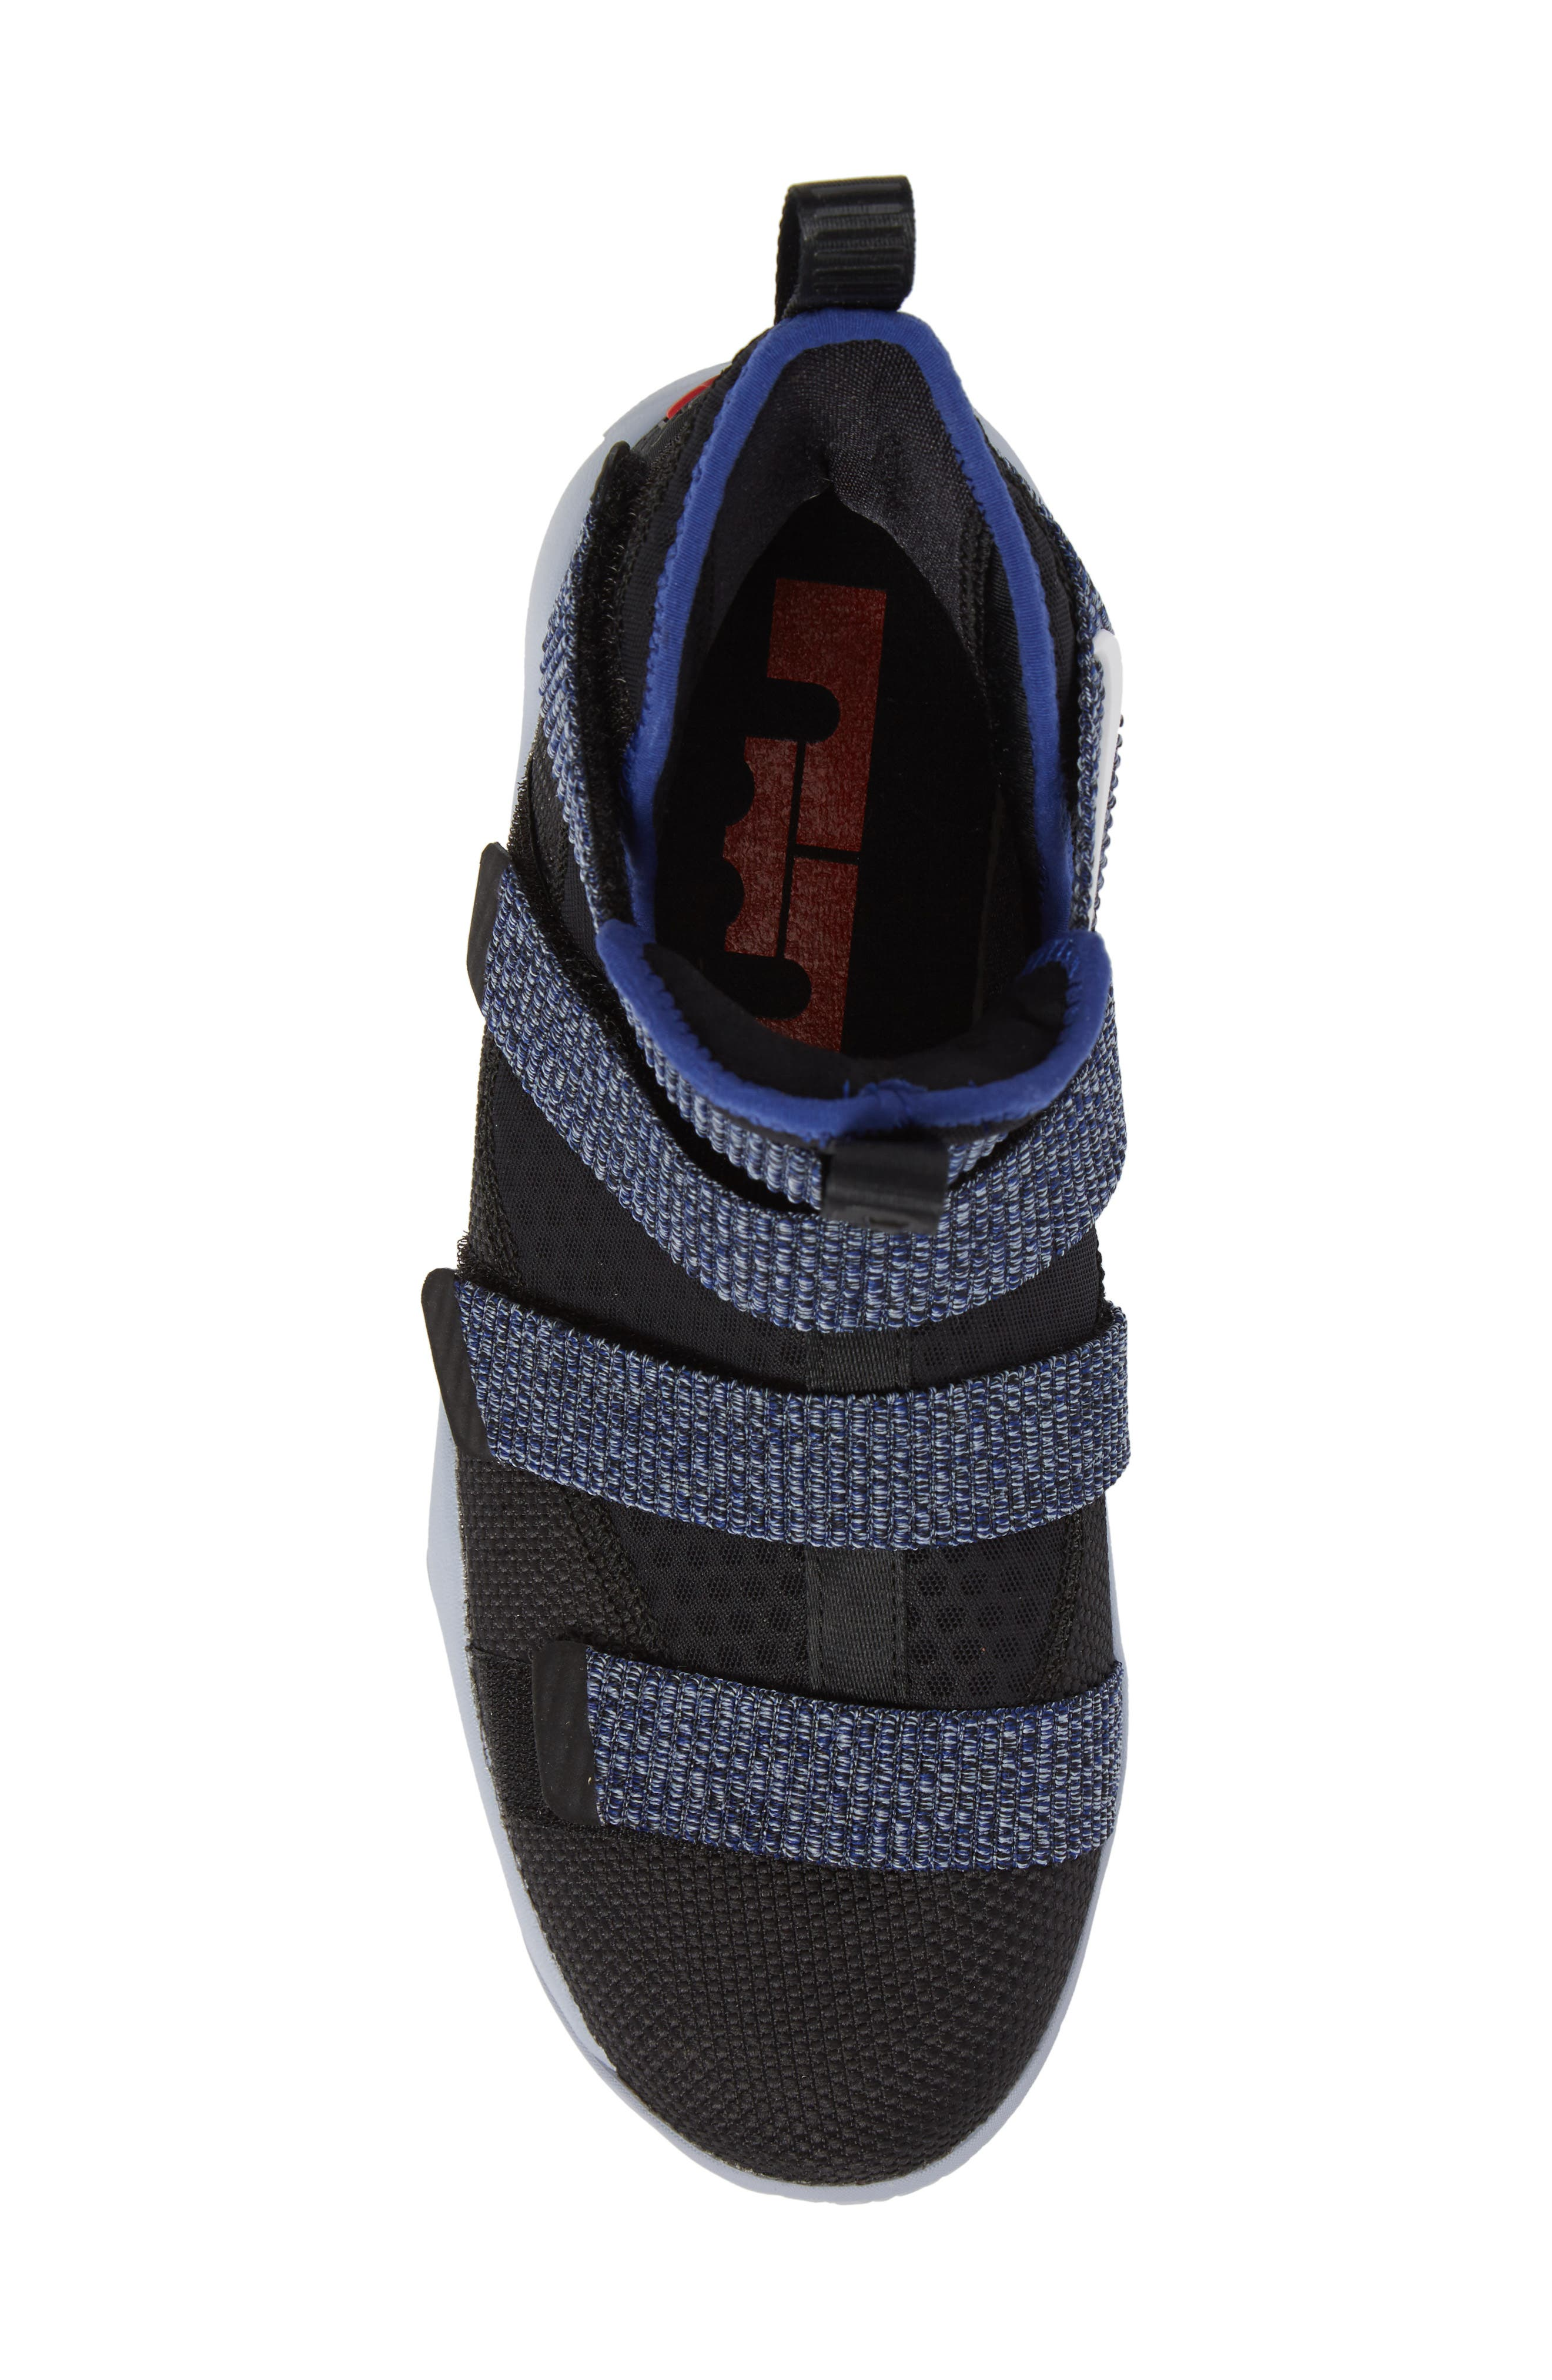 NIKE,                             LeBron Soldier XI Basketball Shoe,                             Alternate thumbnail 5, color,                             005